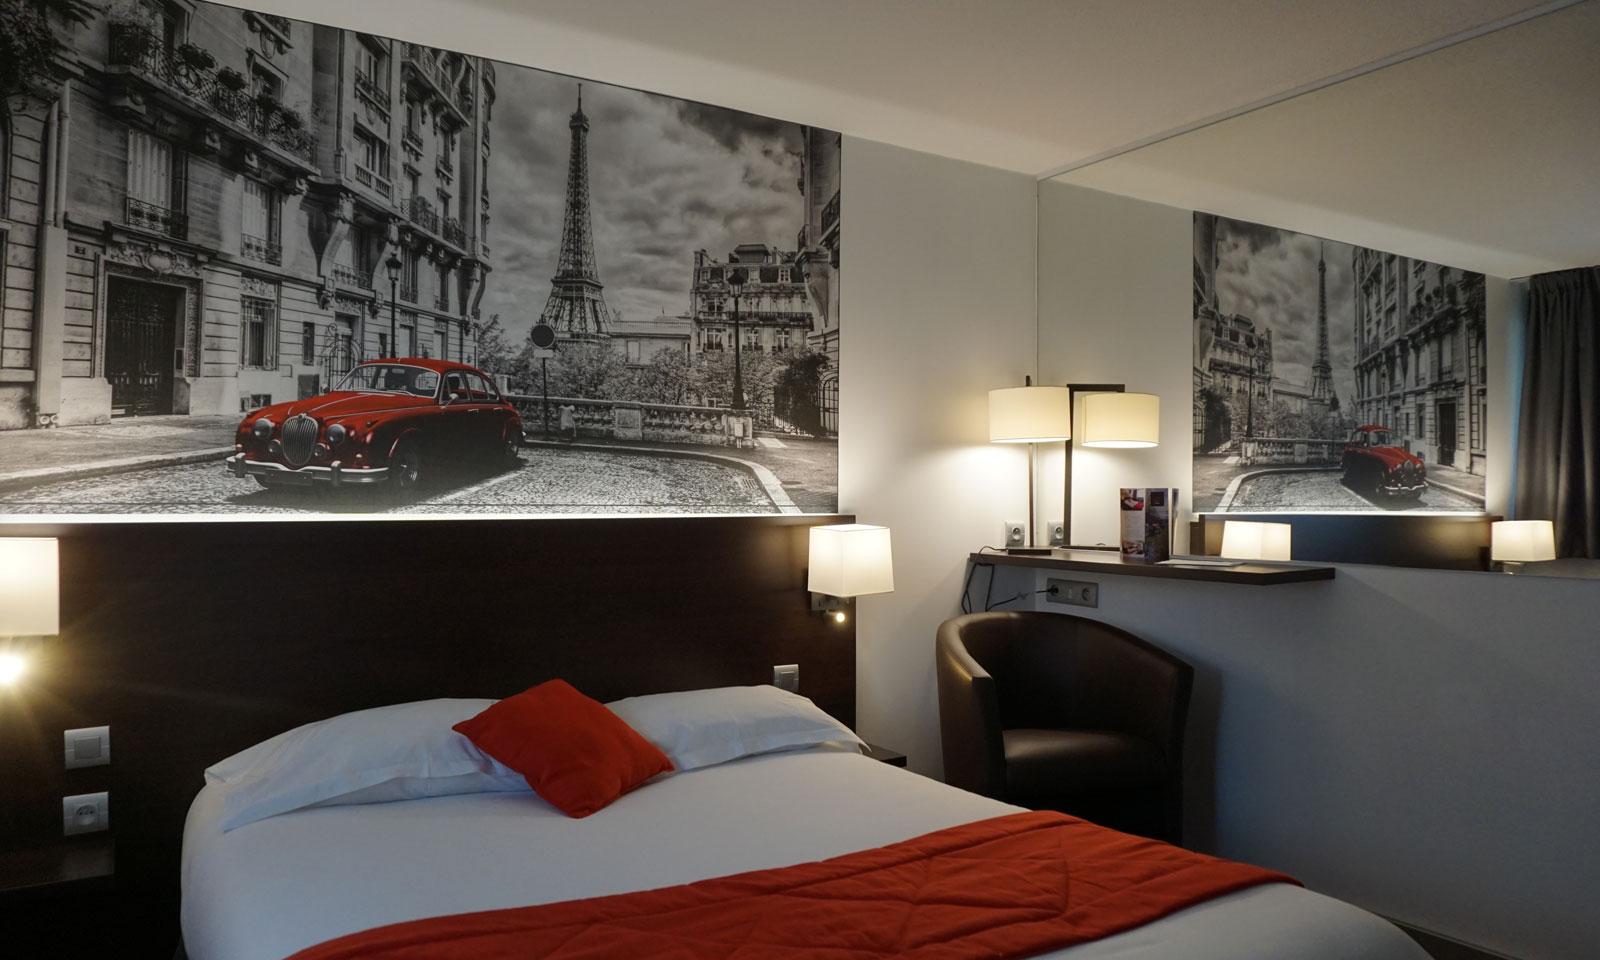 Hotel pavillon gatines